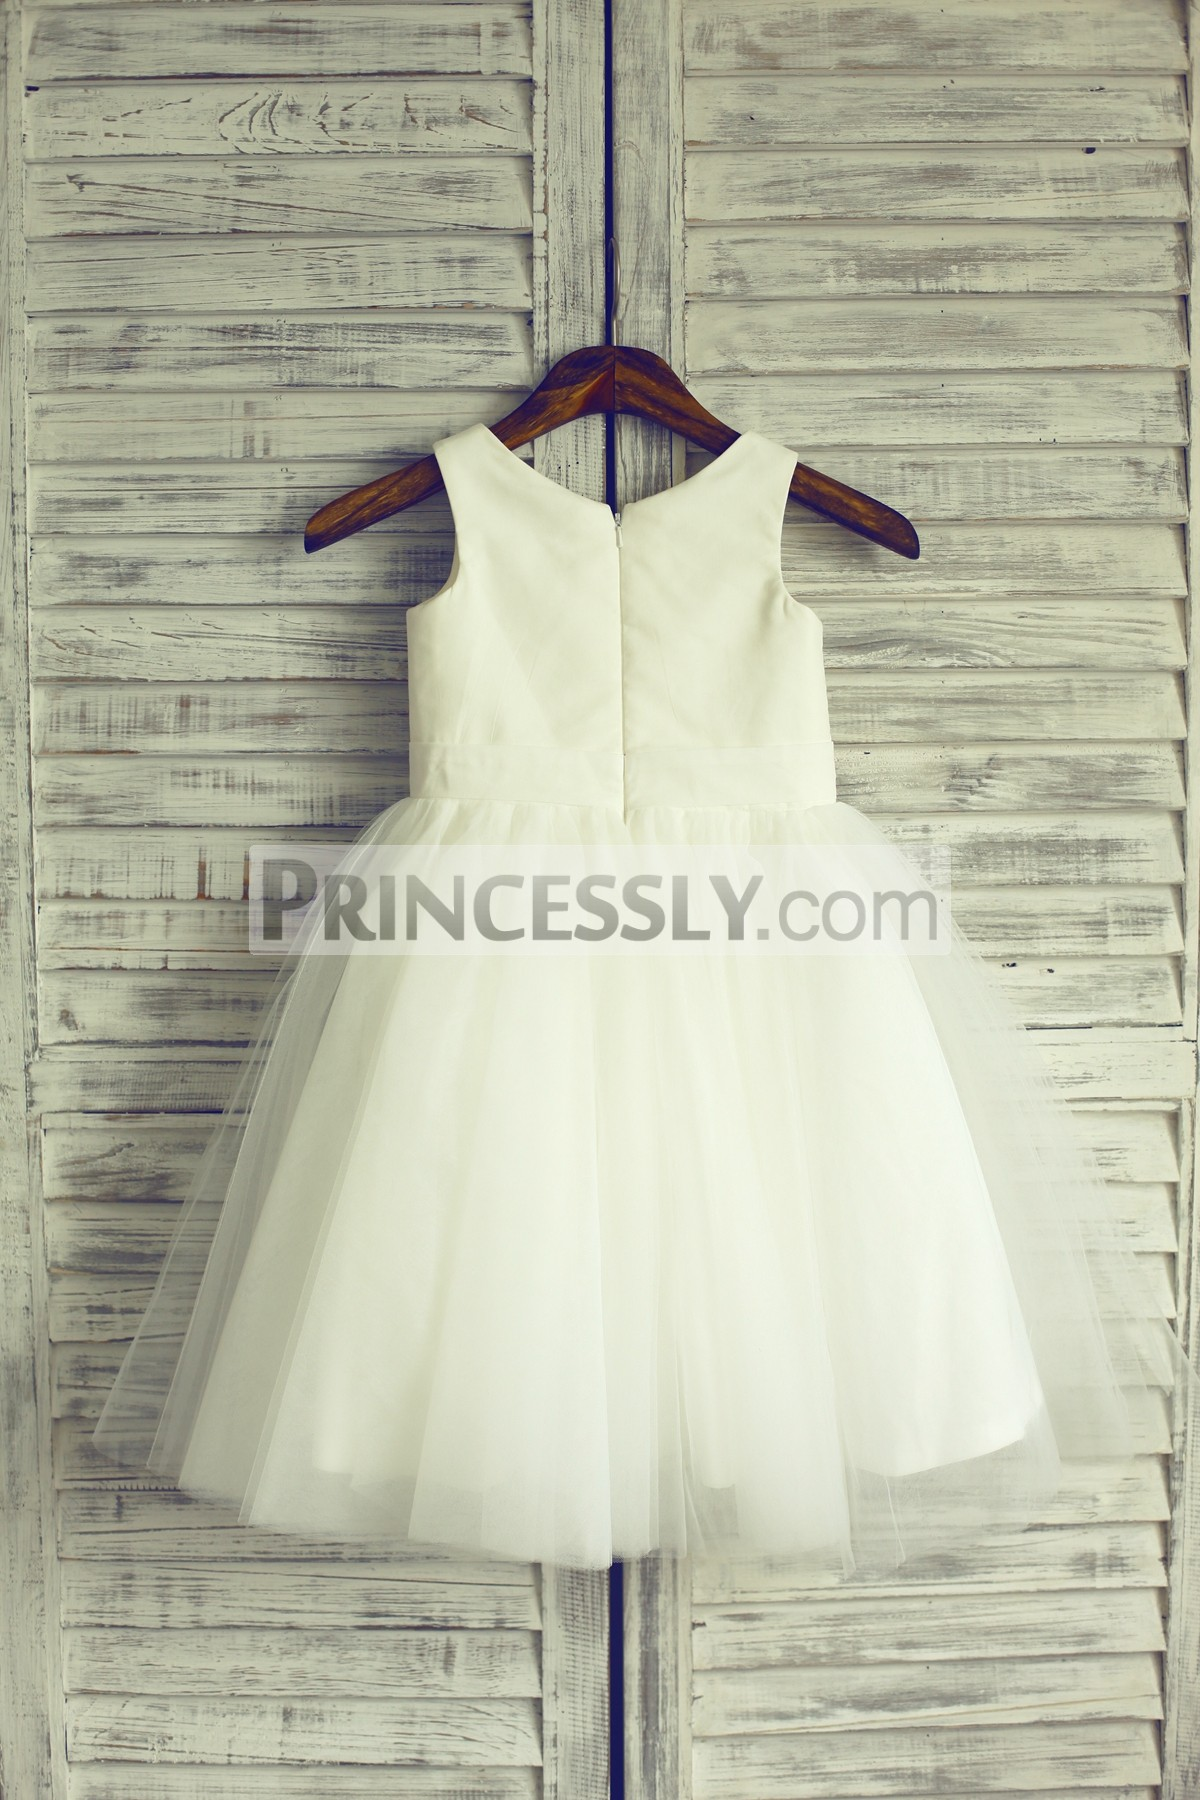 Scoop neck sleeveless ivory satin tulle wedding baby girl dress